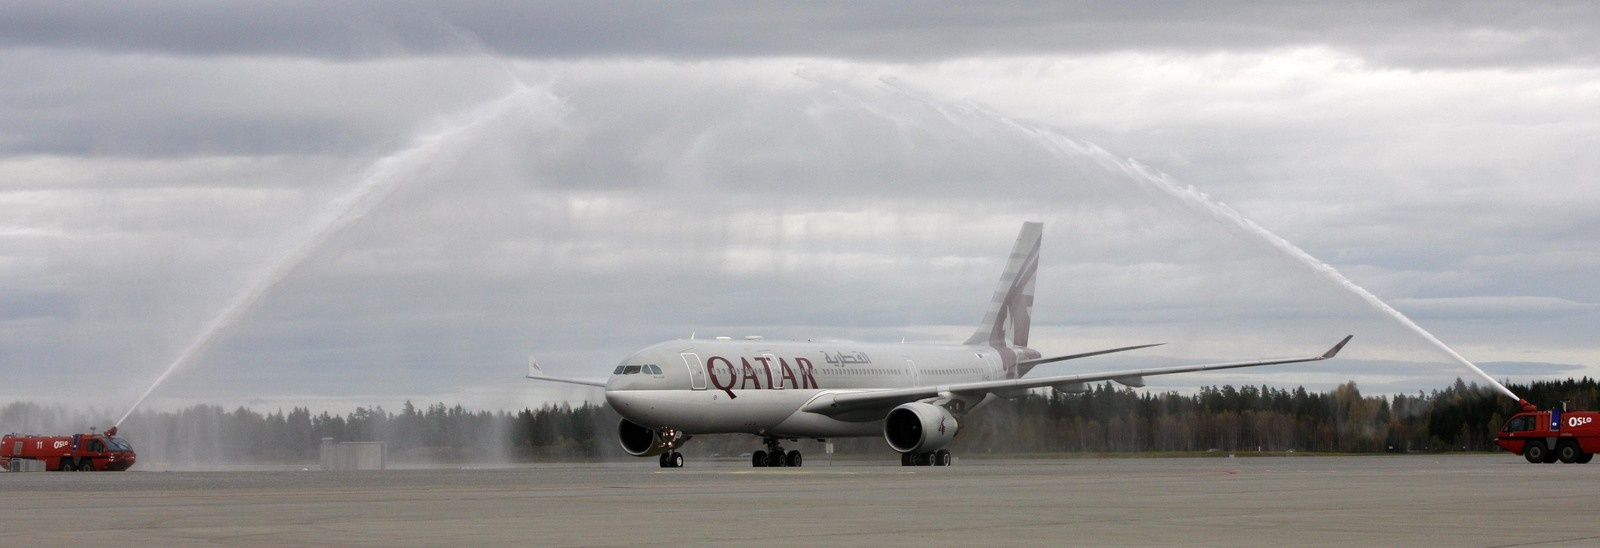 Qatarairways flyger till oslo